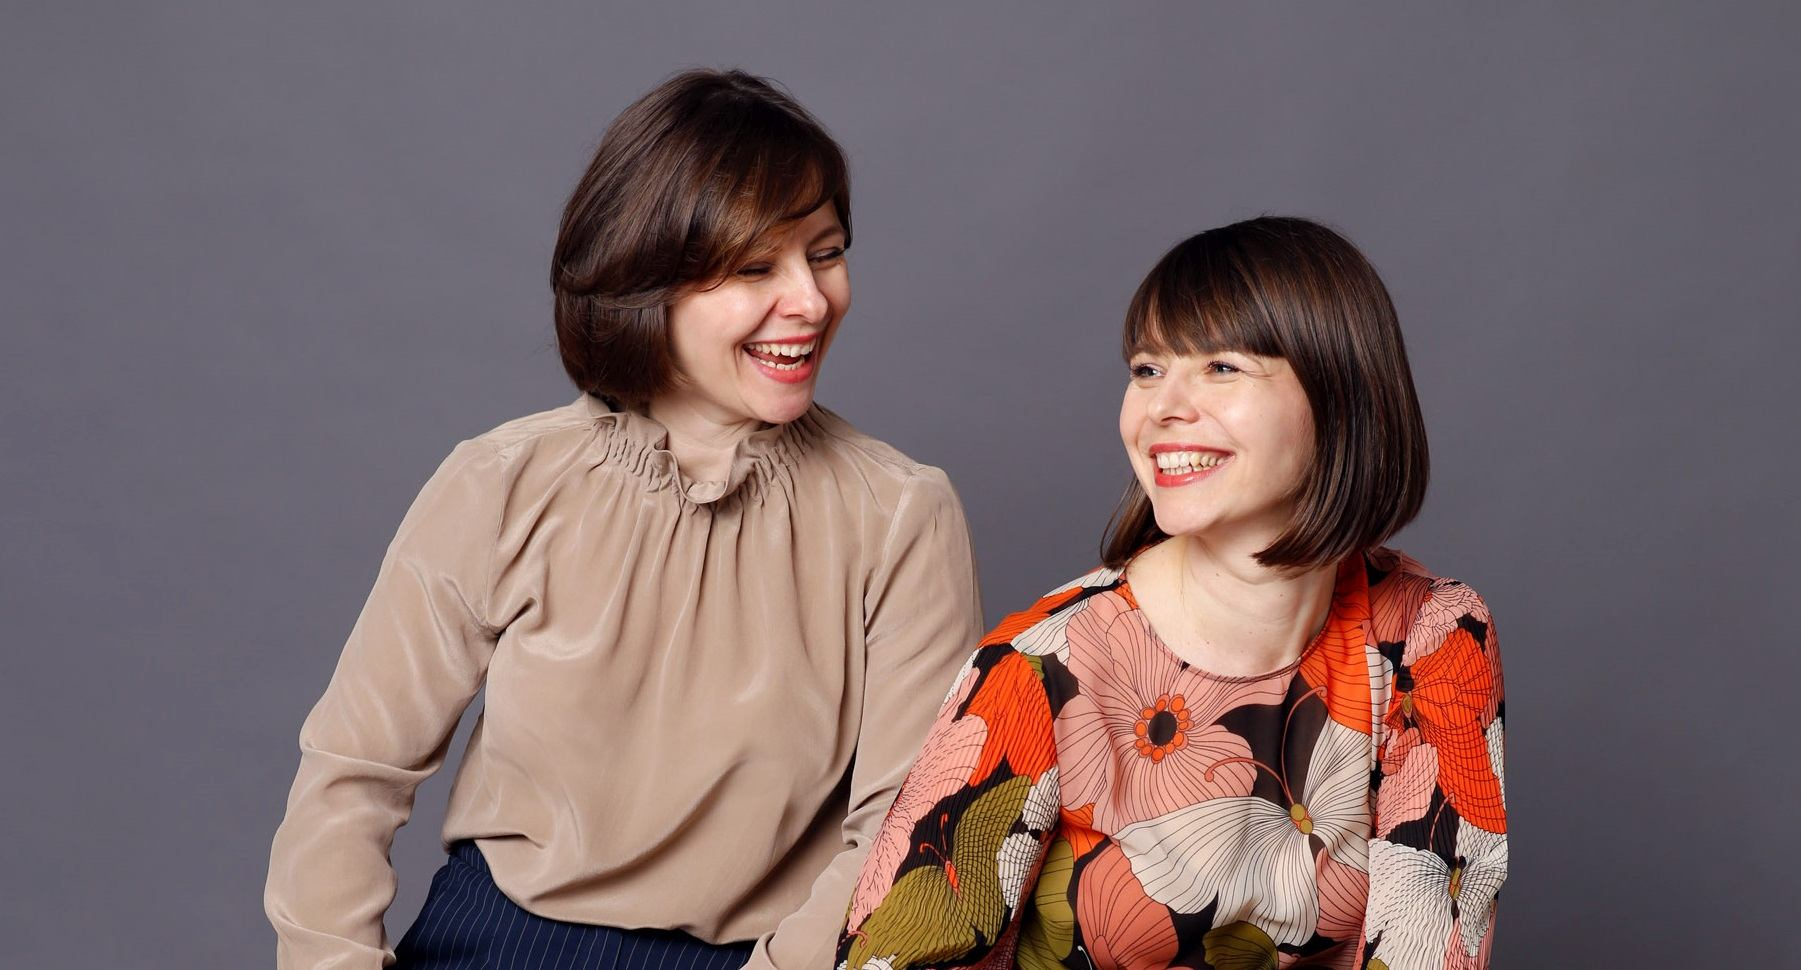 Personal Stylists Nina und Lena von Style Advisor Twins